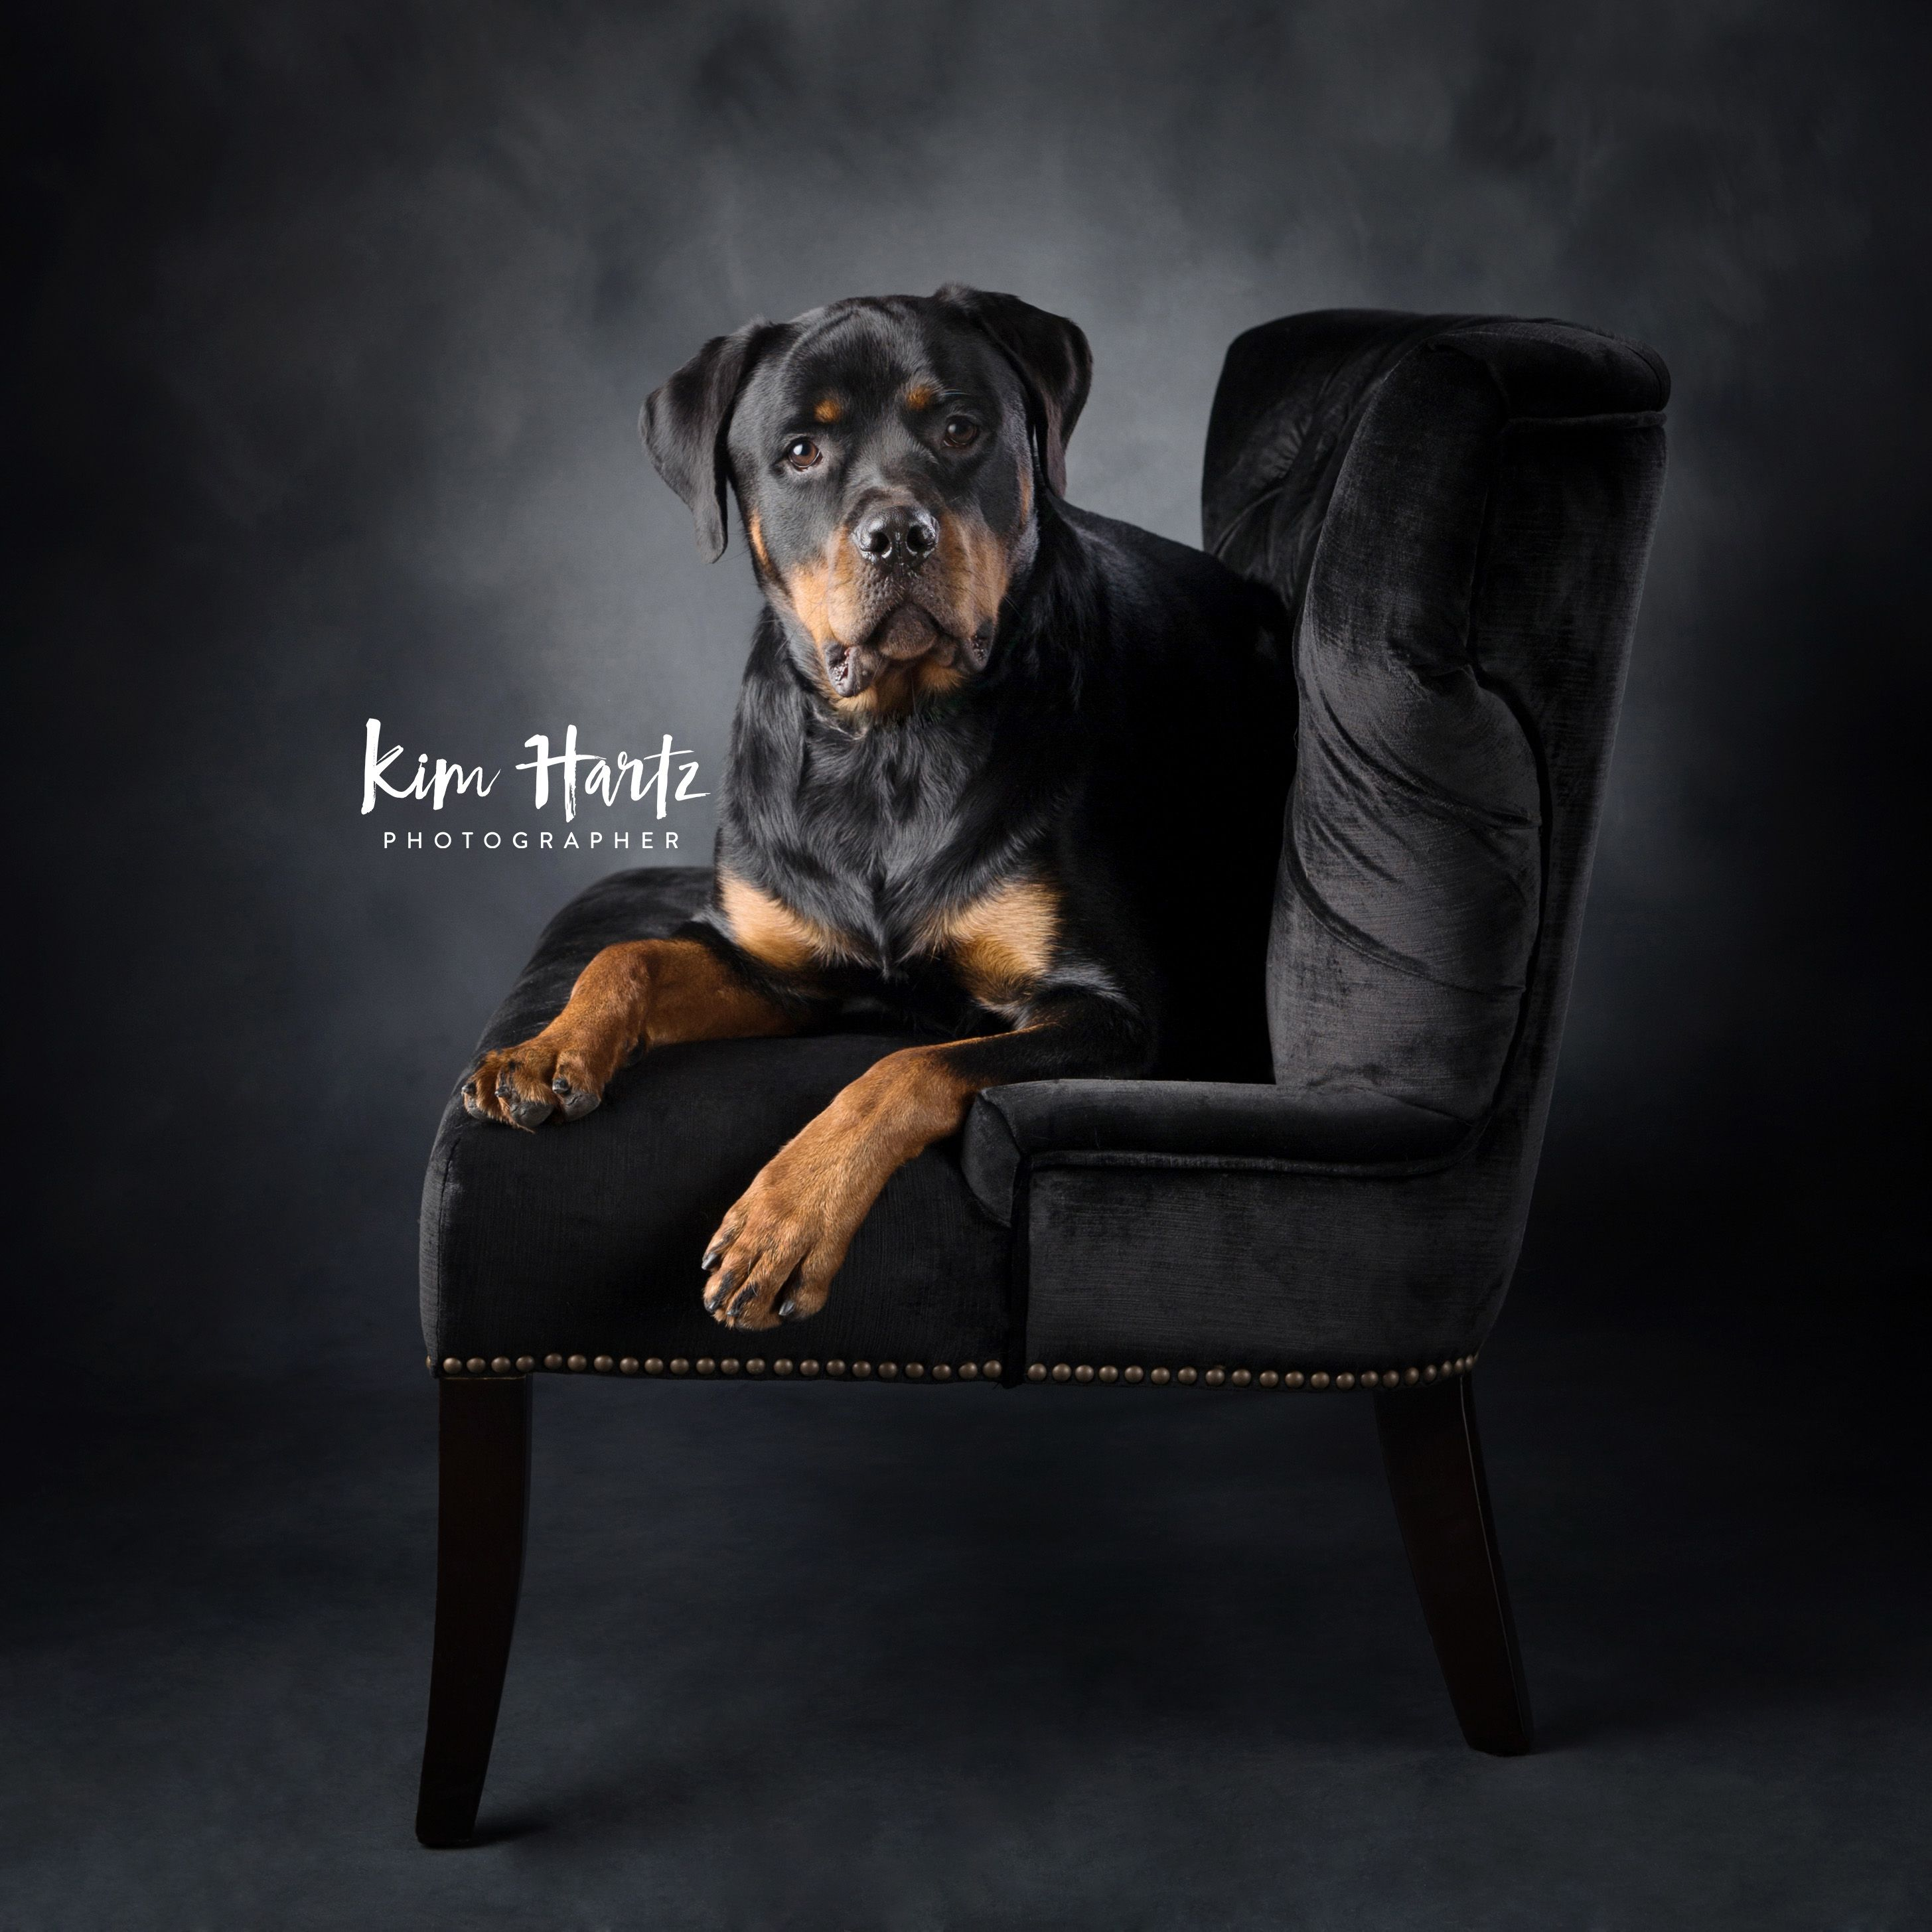 Kim Hartz Photographer Pet Portraits Pet Photographer Rottweiler Pet Photography Pets Rottweiler Dog Rottweiler Puppies